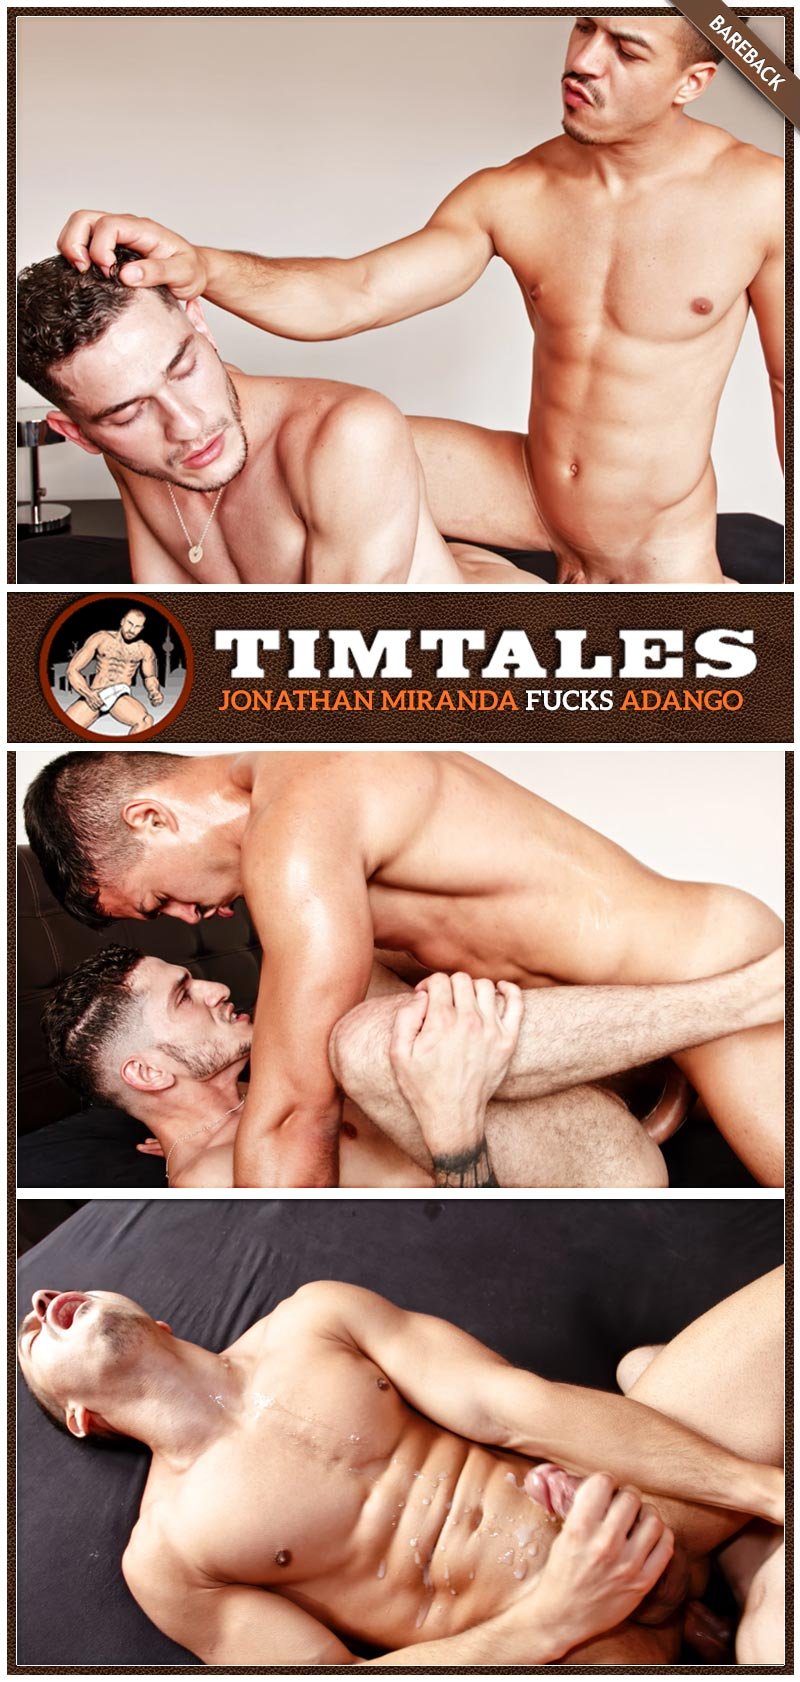 Jonathan Miranda Fucks Adango (Bareback) at TimTales